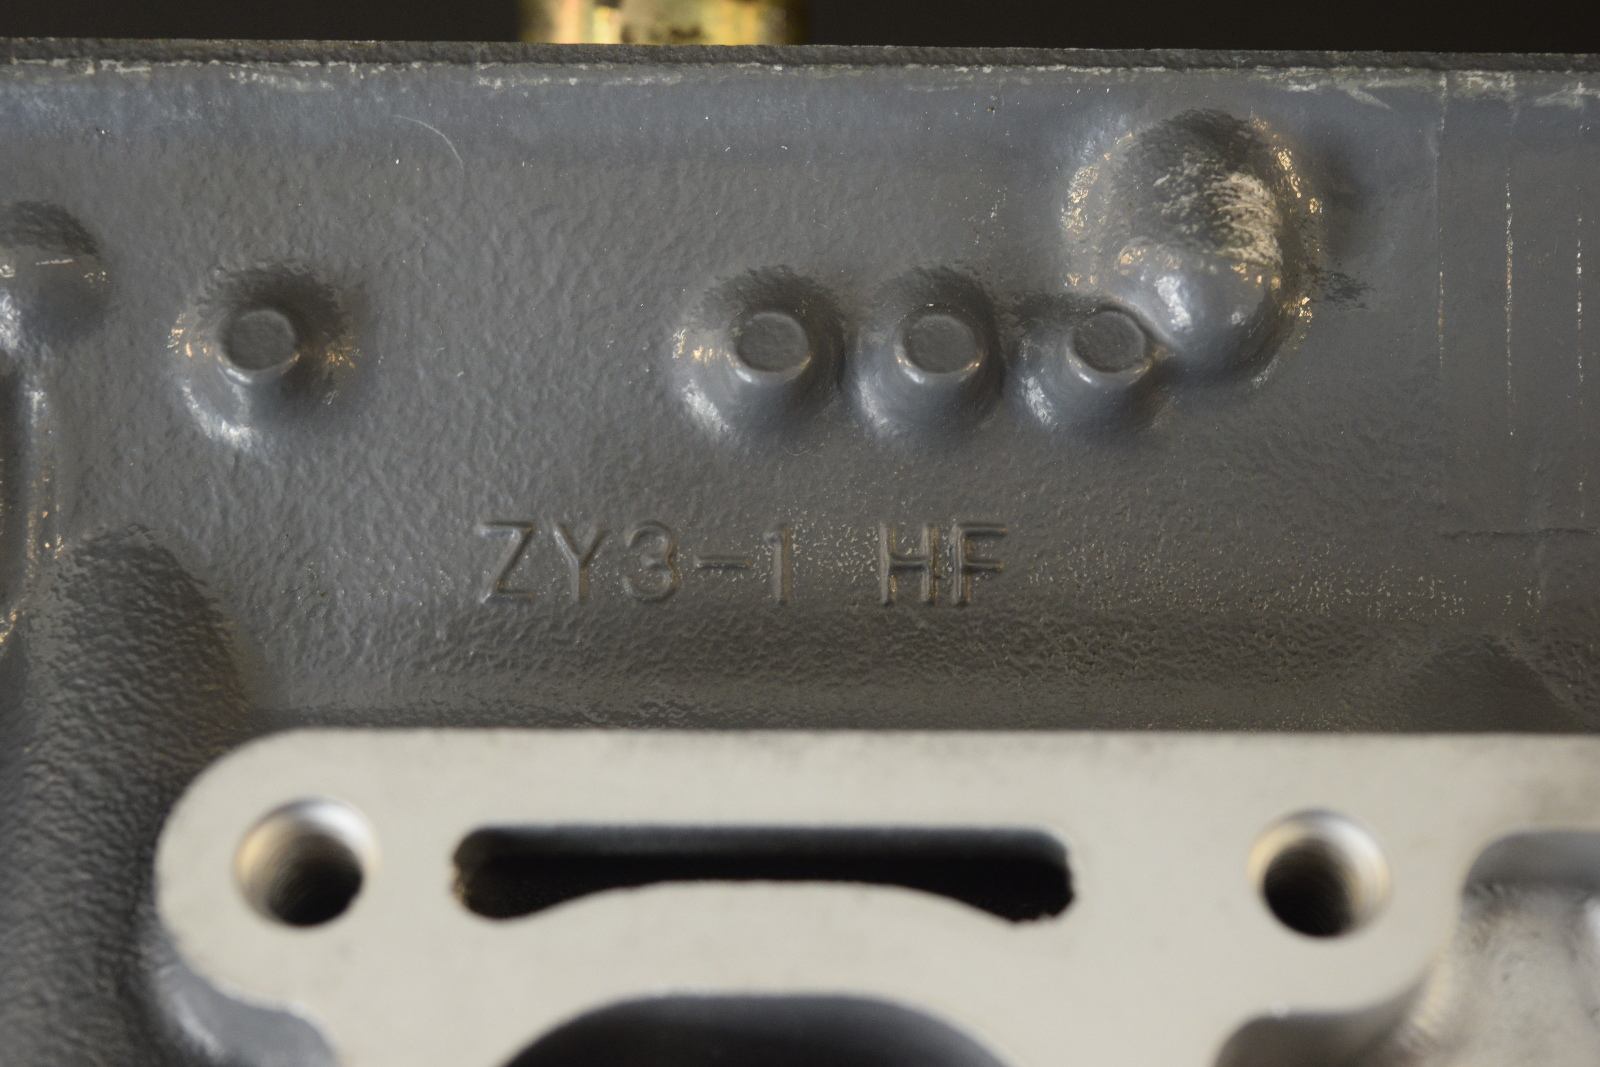 12225-ZY3-000ZA Honda 2002-05 PORT Cylinder Head Assy 200 225 HP  REMANUFACTURED